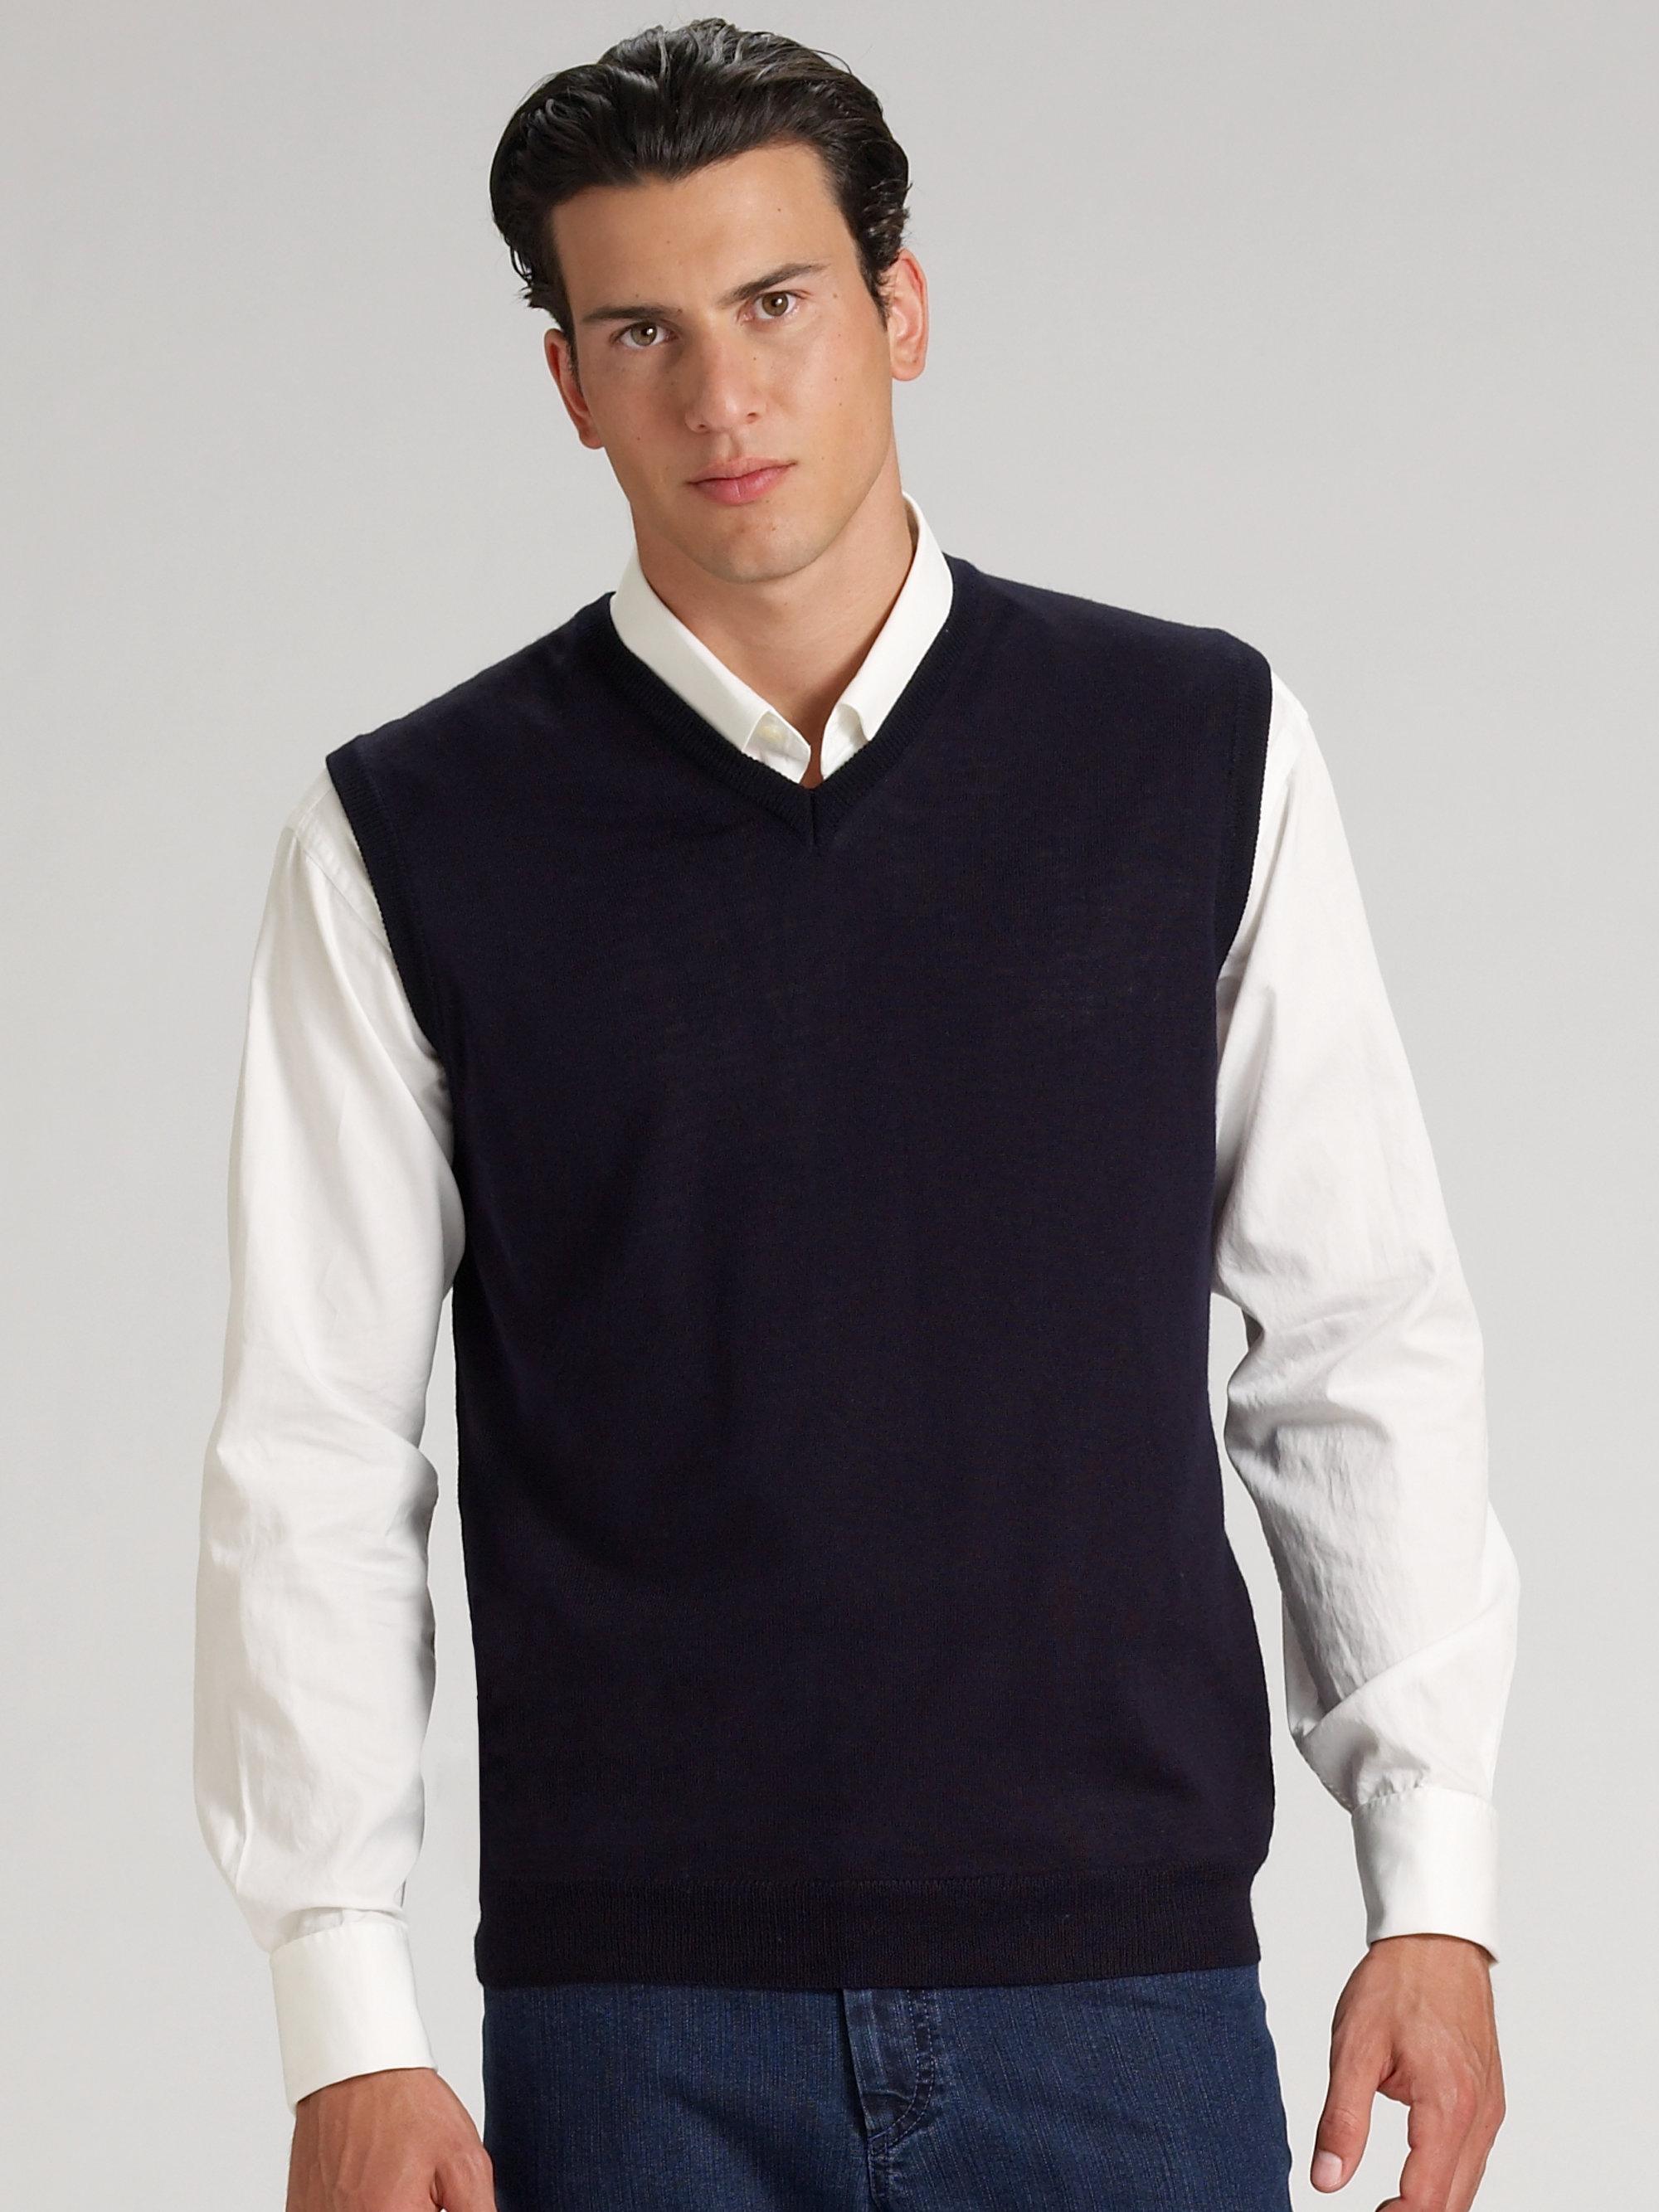 Saks fifth avenue Vneck Merino Sweater Vest in Black for Men | Lyst